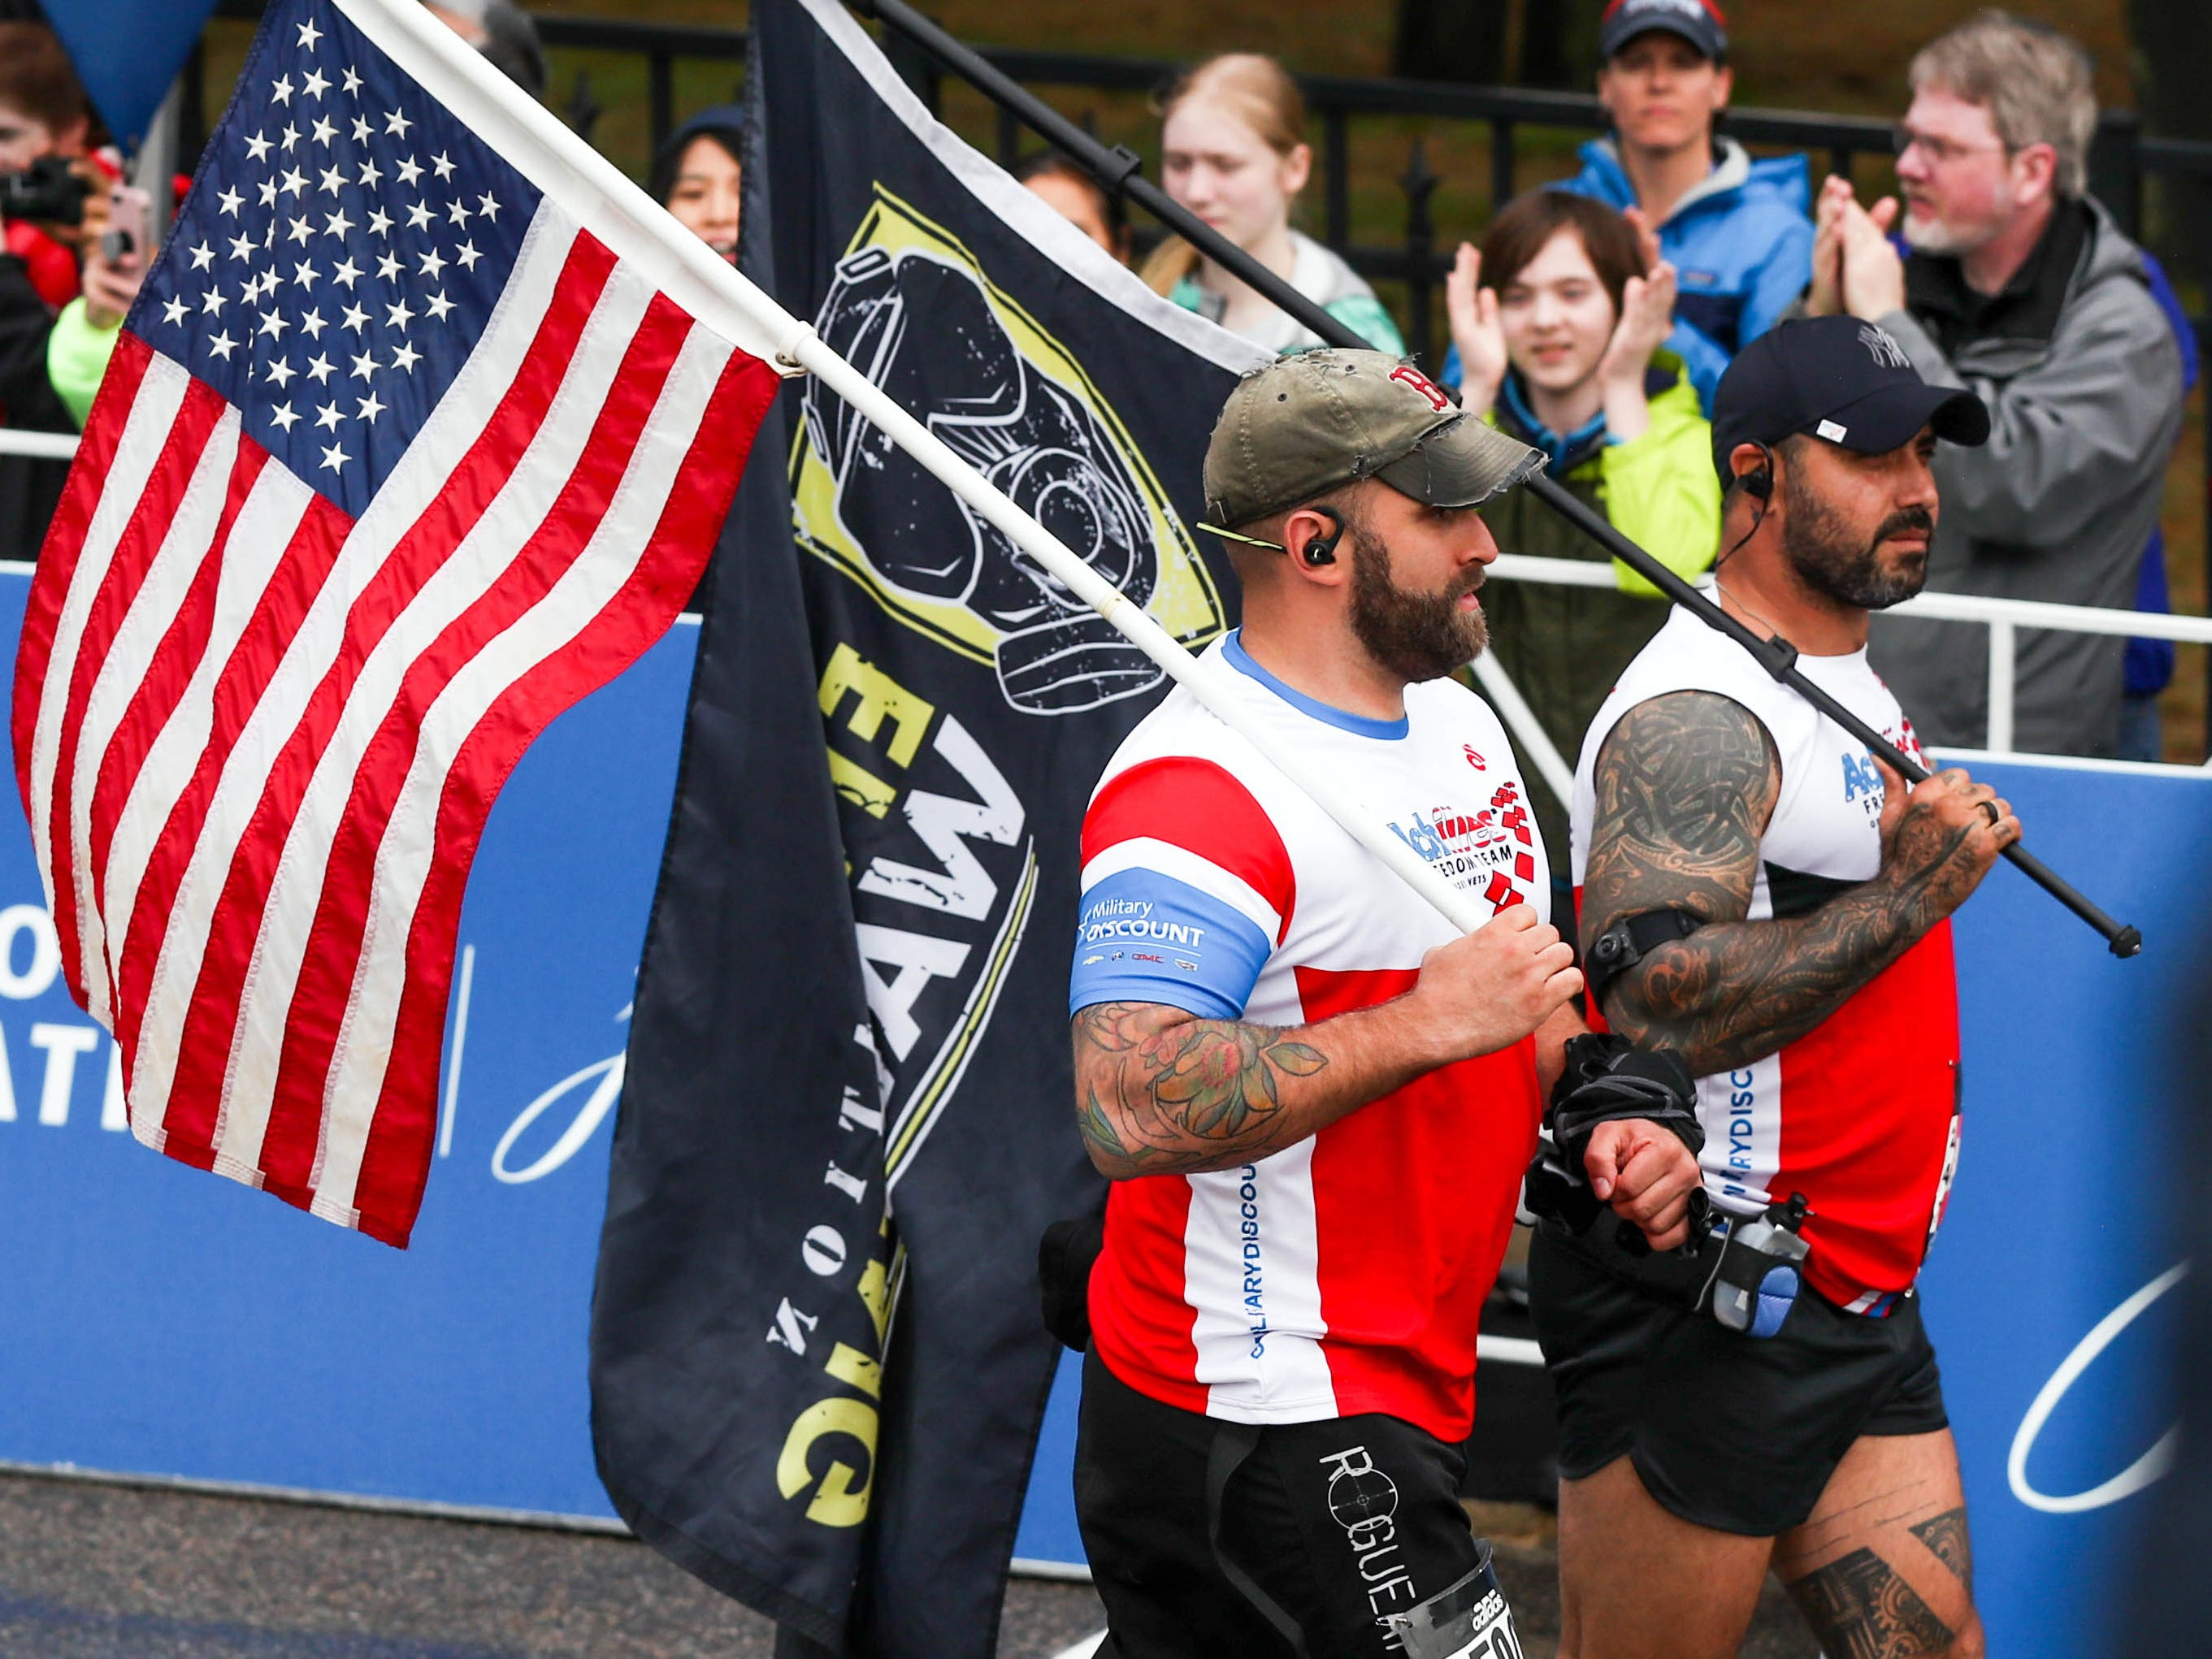 Christopher Reischel holds an American flag at the Boston Marathon starting line.